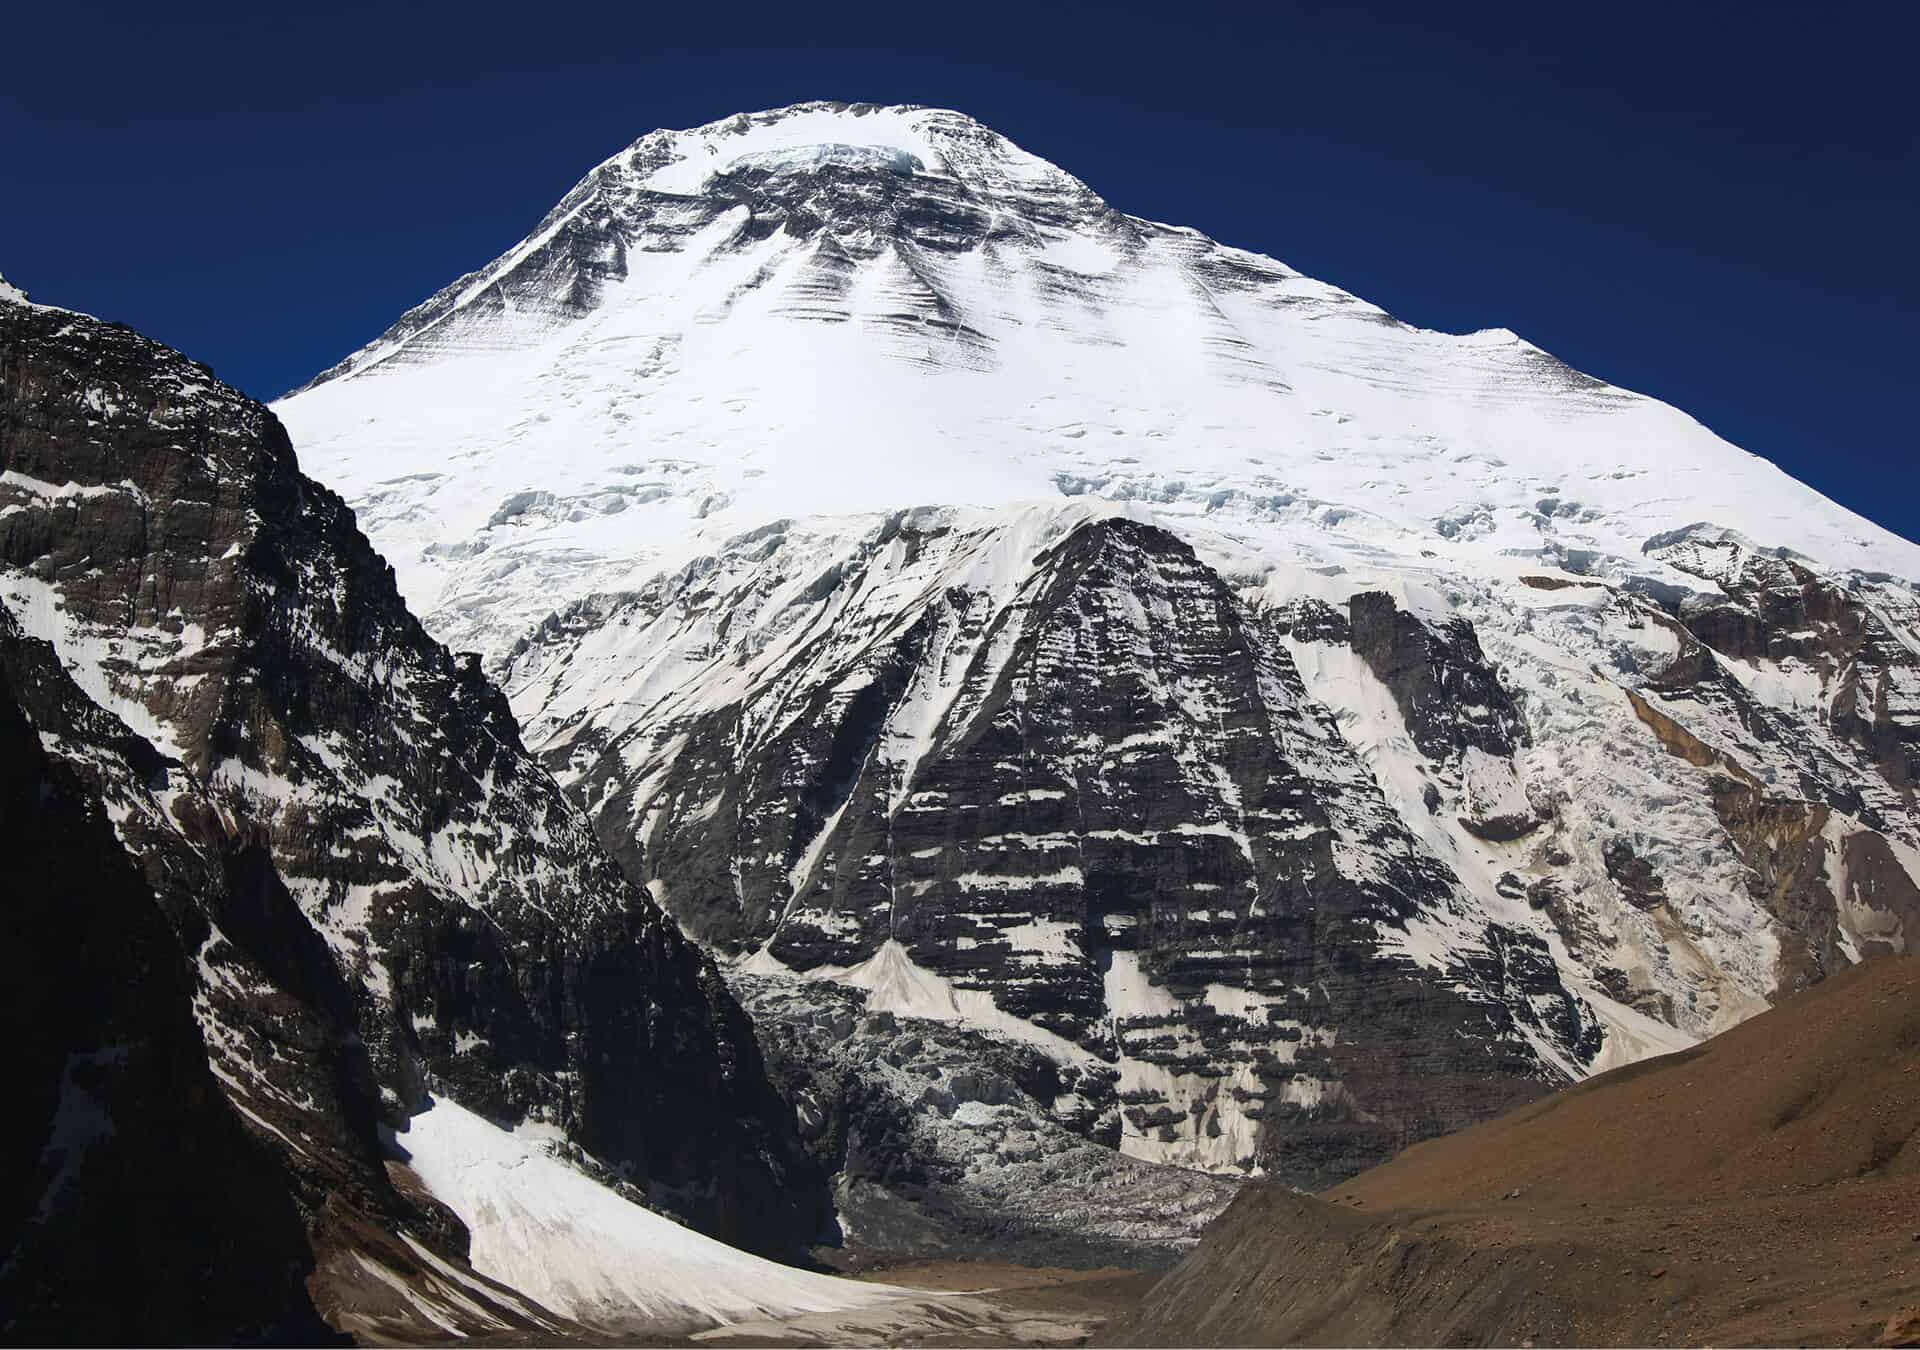 8000m峰14座とは   プロ登山家 竹内洋岳 公式サイト